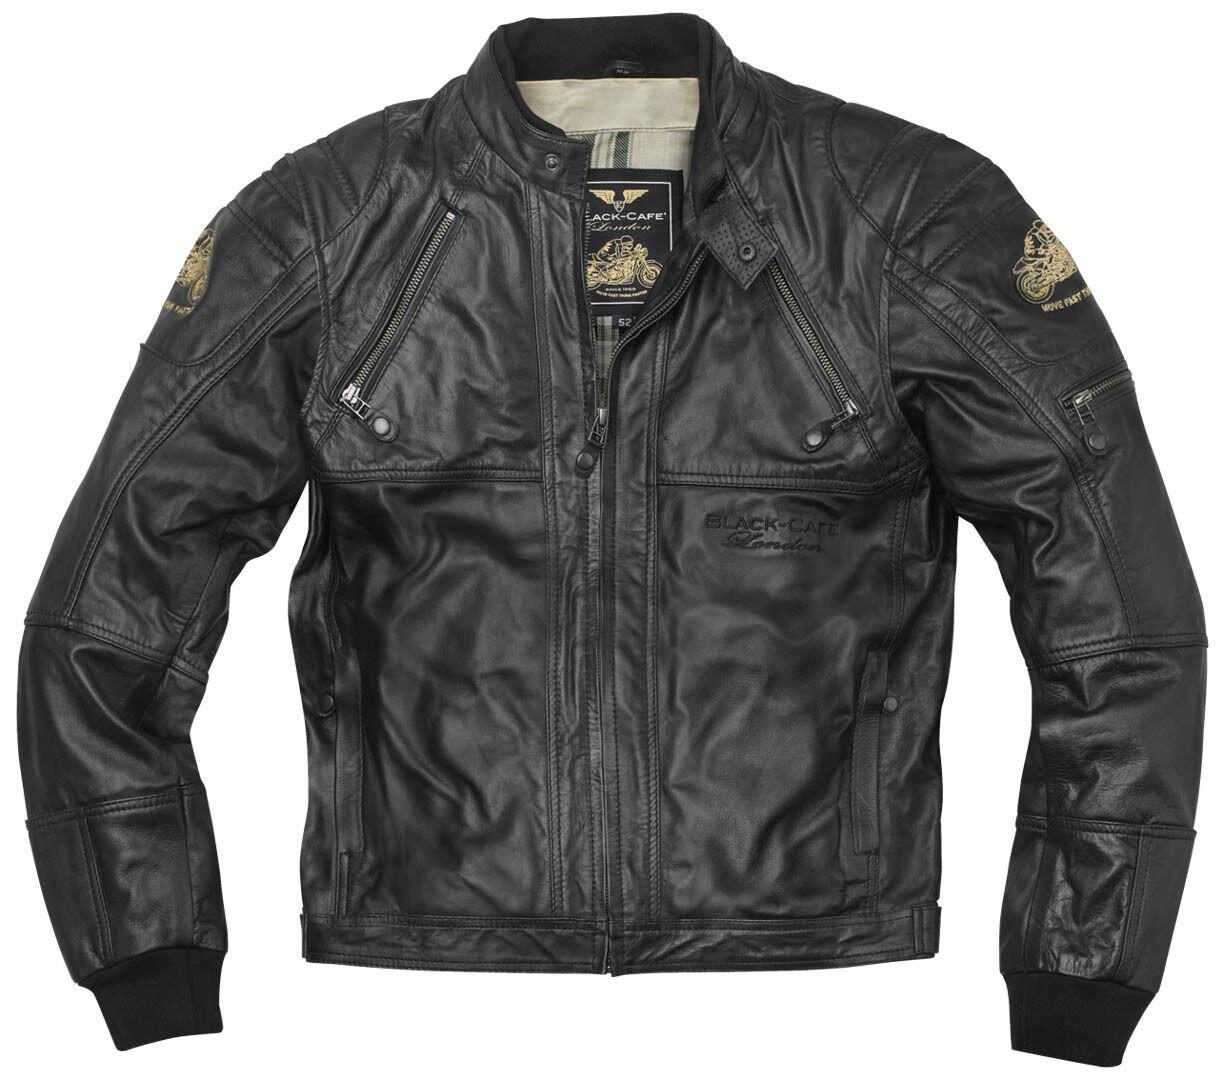 Black-Cafe London Dallas Veste en cuir de moto Noir taille : 58